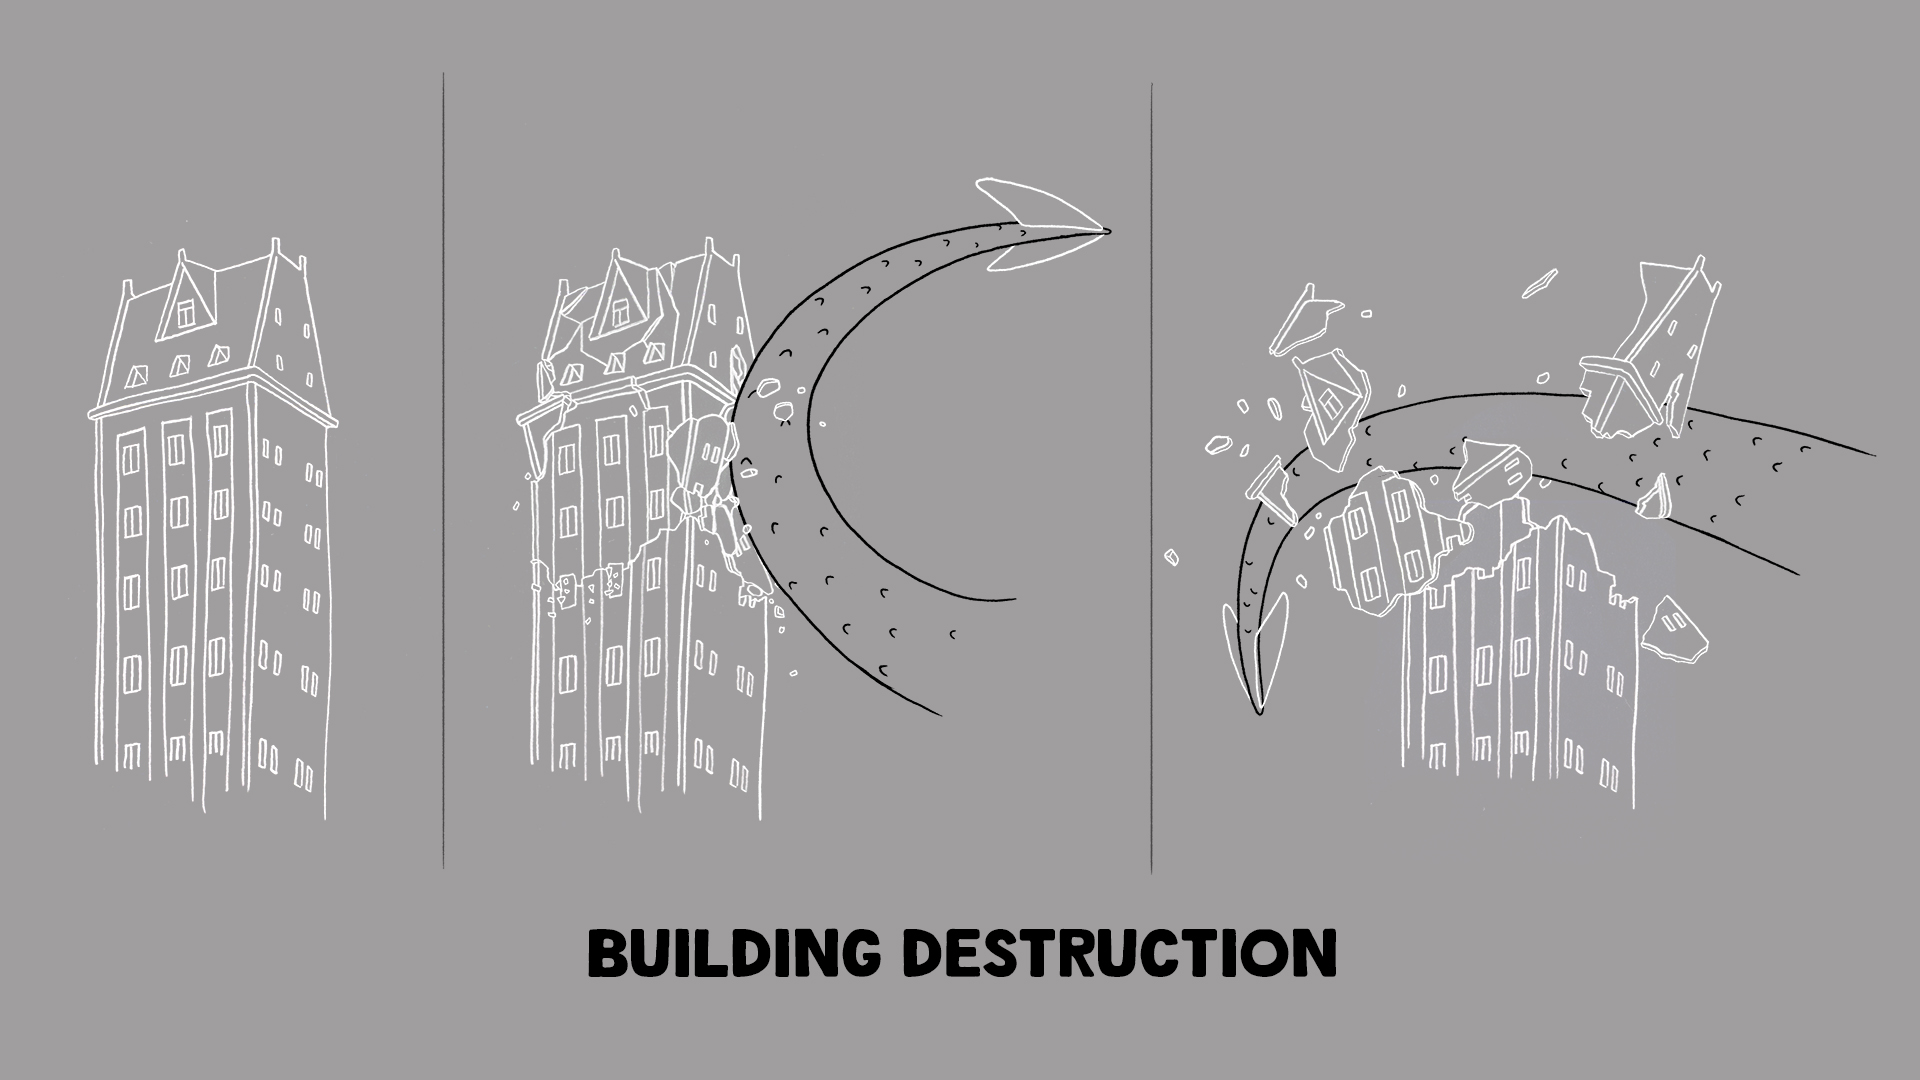 City_Destruction_002.jpg